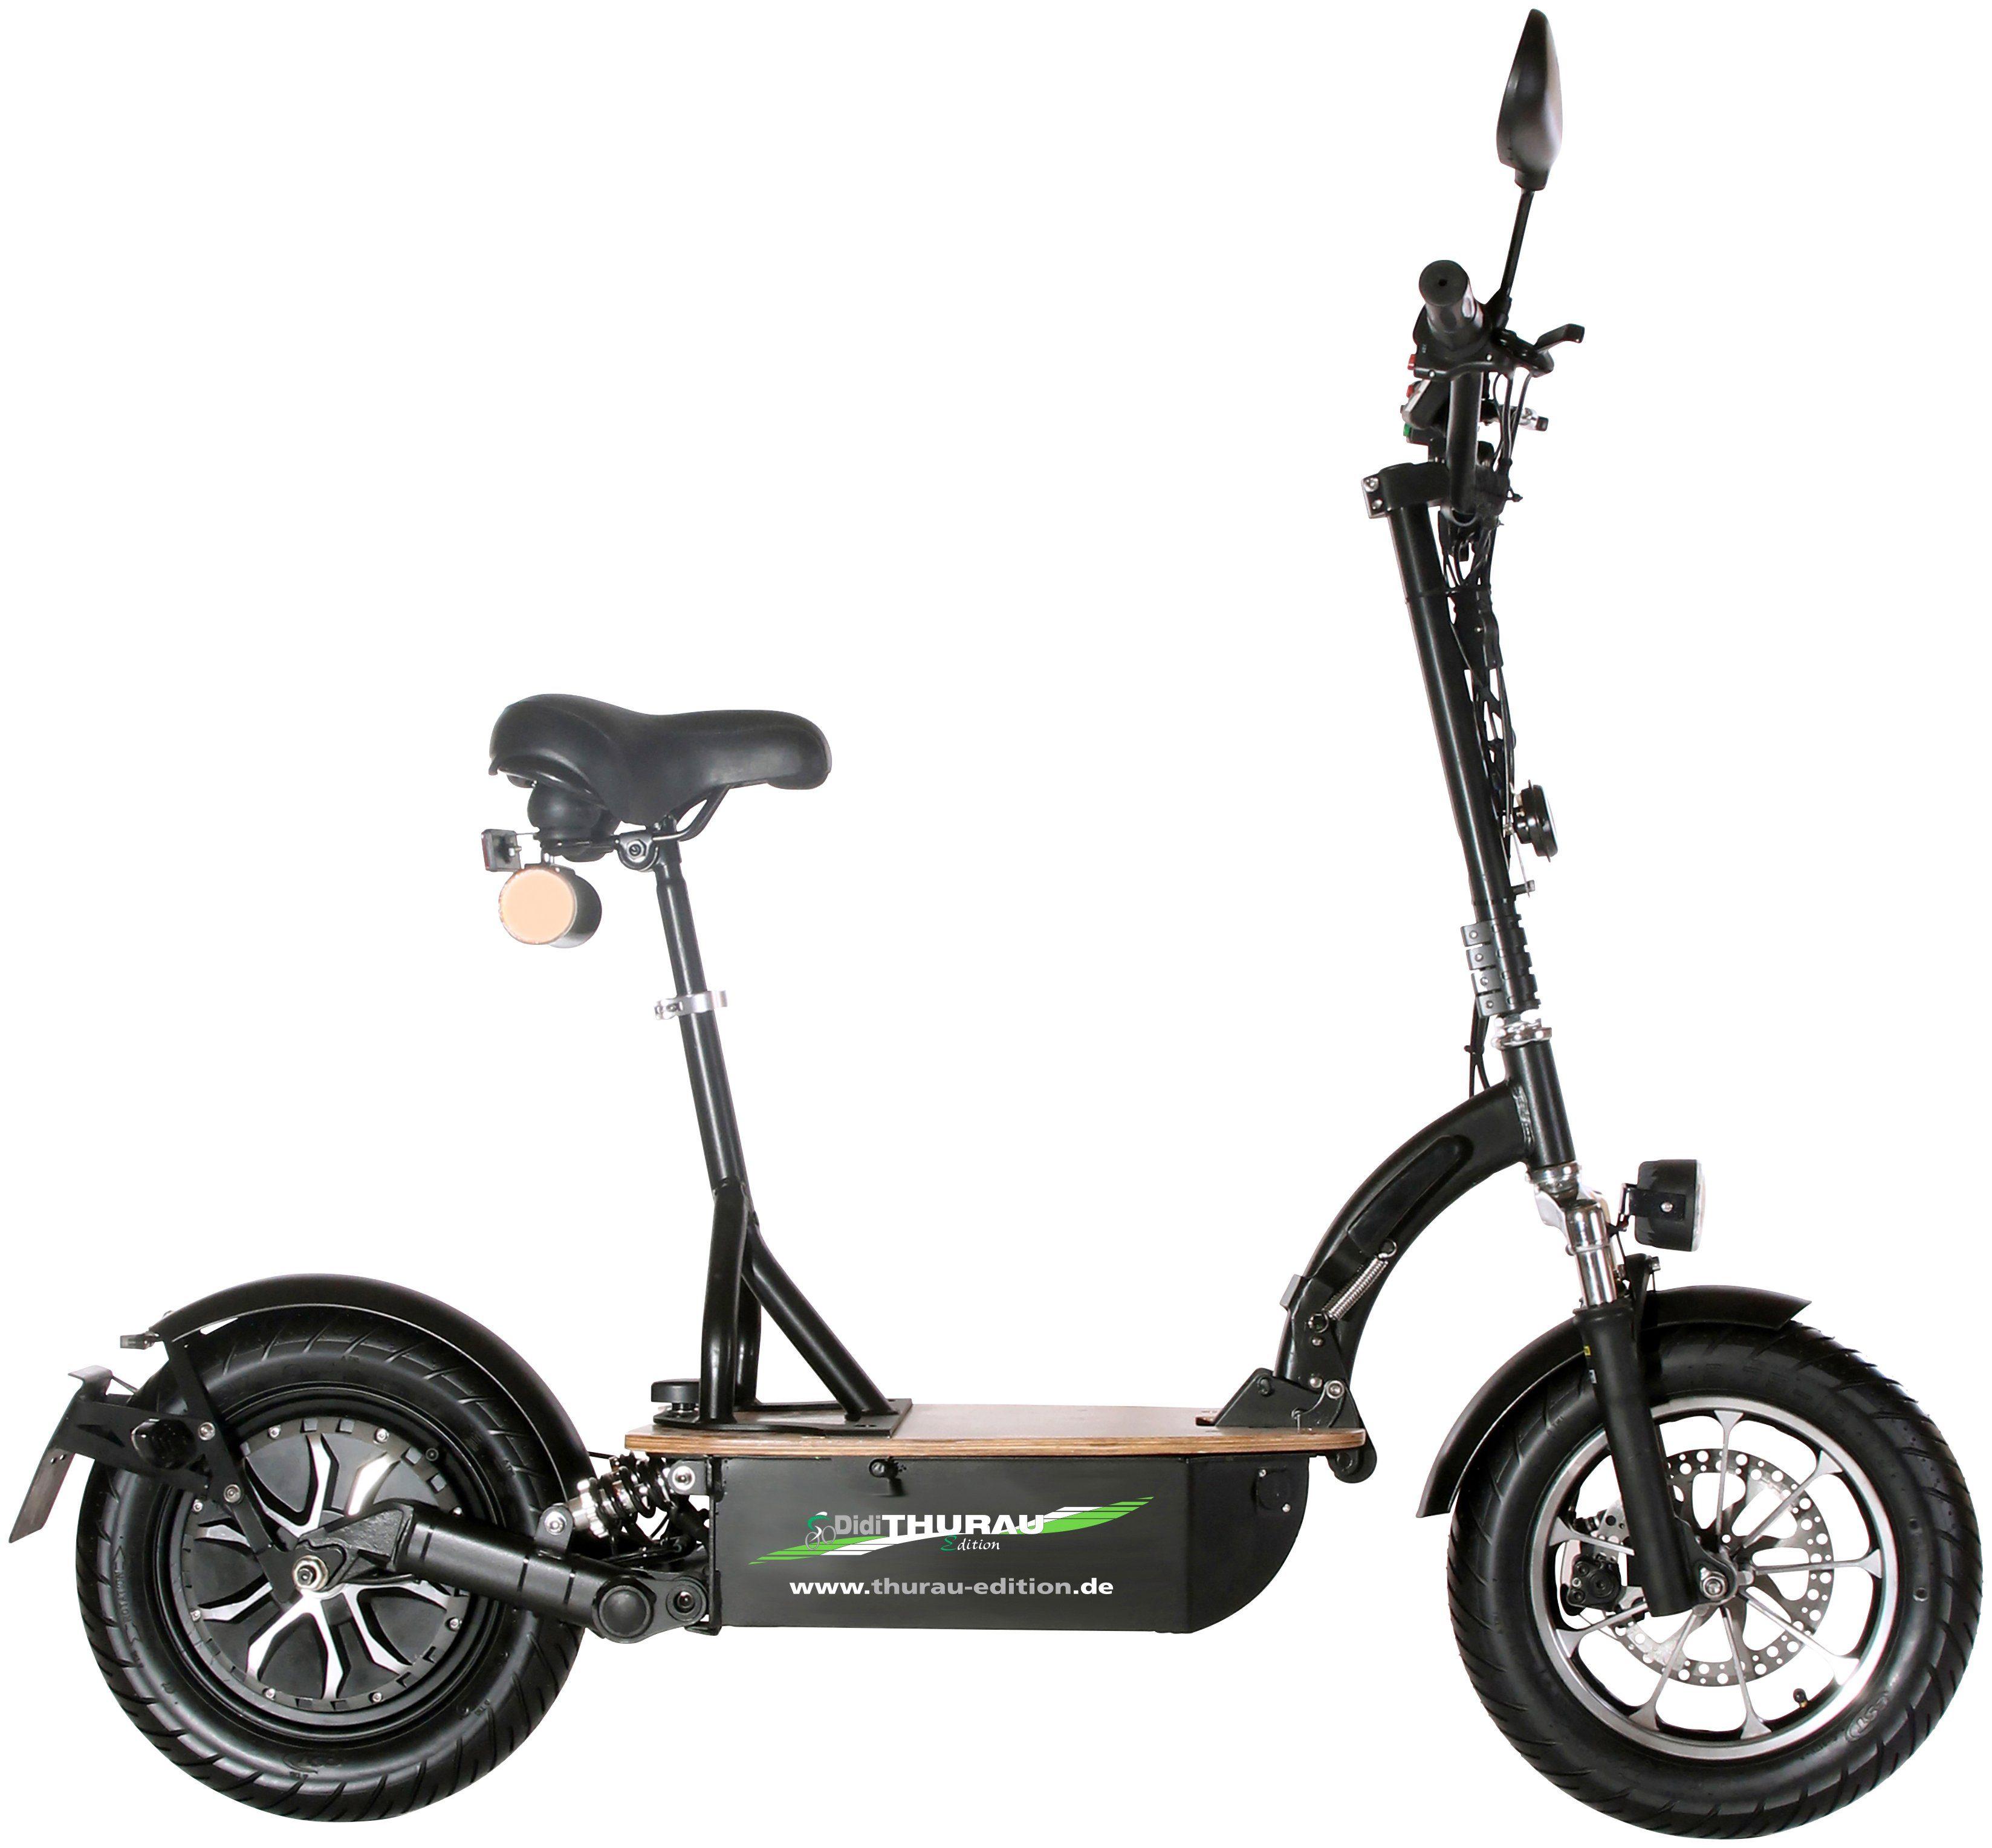 DIDI THURAU E-Scooter »Eco-Tourer Basic RSP«, 45 km/h, Inkl. Rundum-Sorglos-Paket